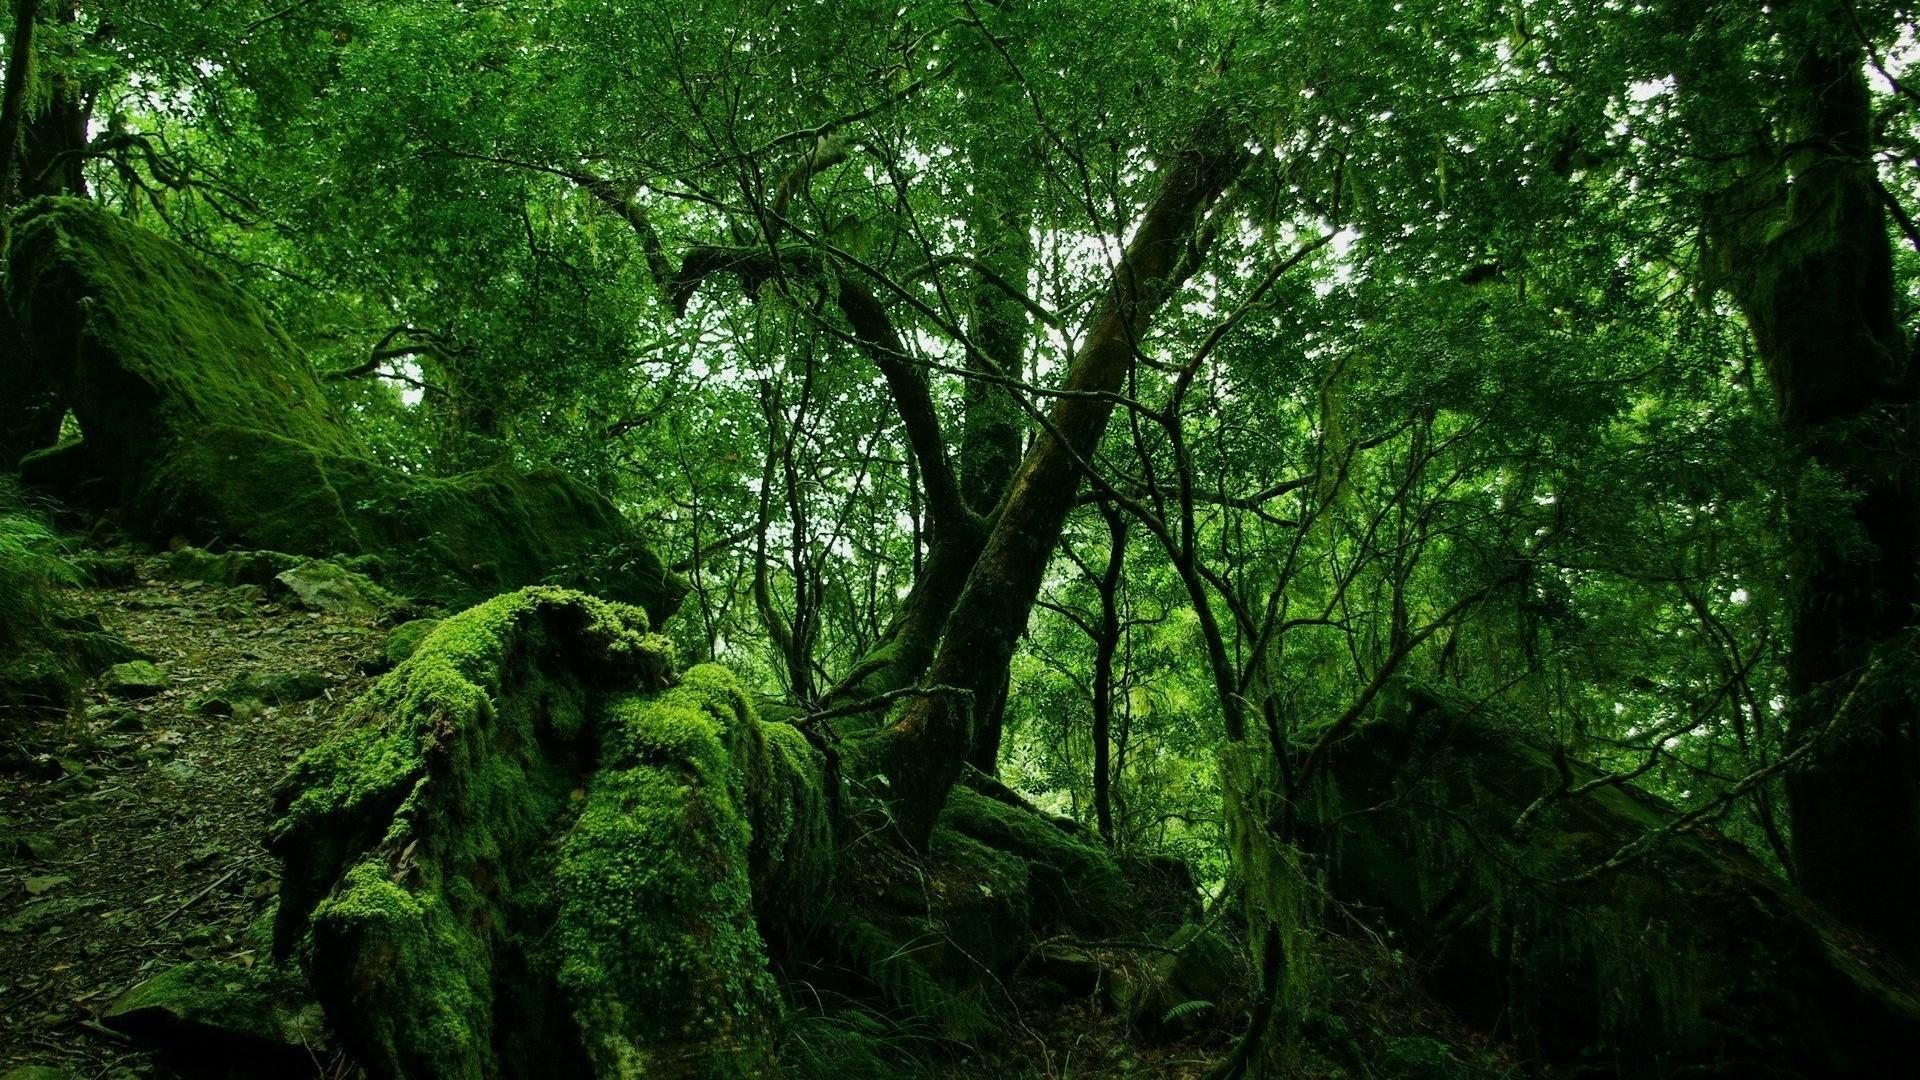 Jungle Wallpaper (72+ Images